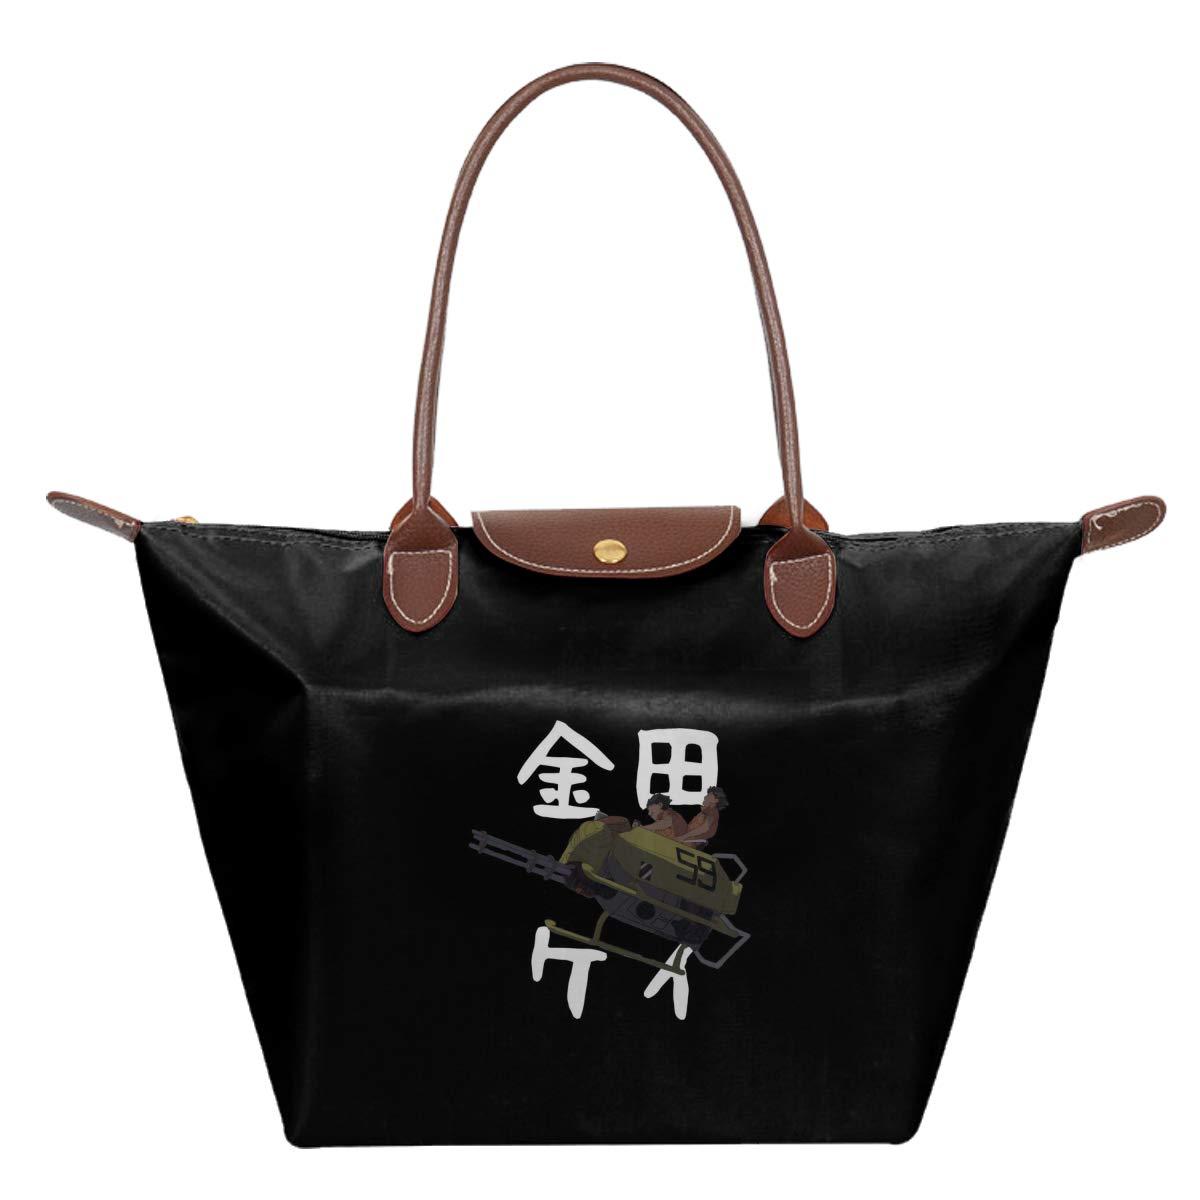 Akira Hover Car Waterproof Leather Folded Messenger Nylon Bag Travel Tote Hopping Folding School Handbags